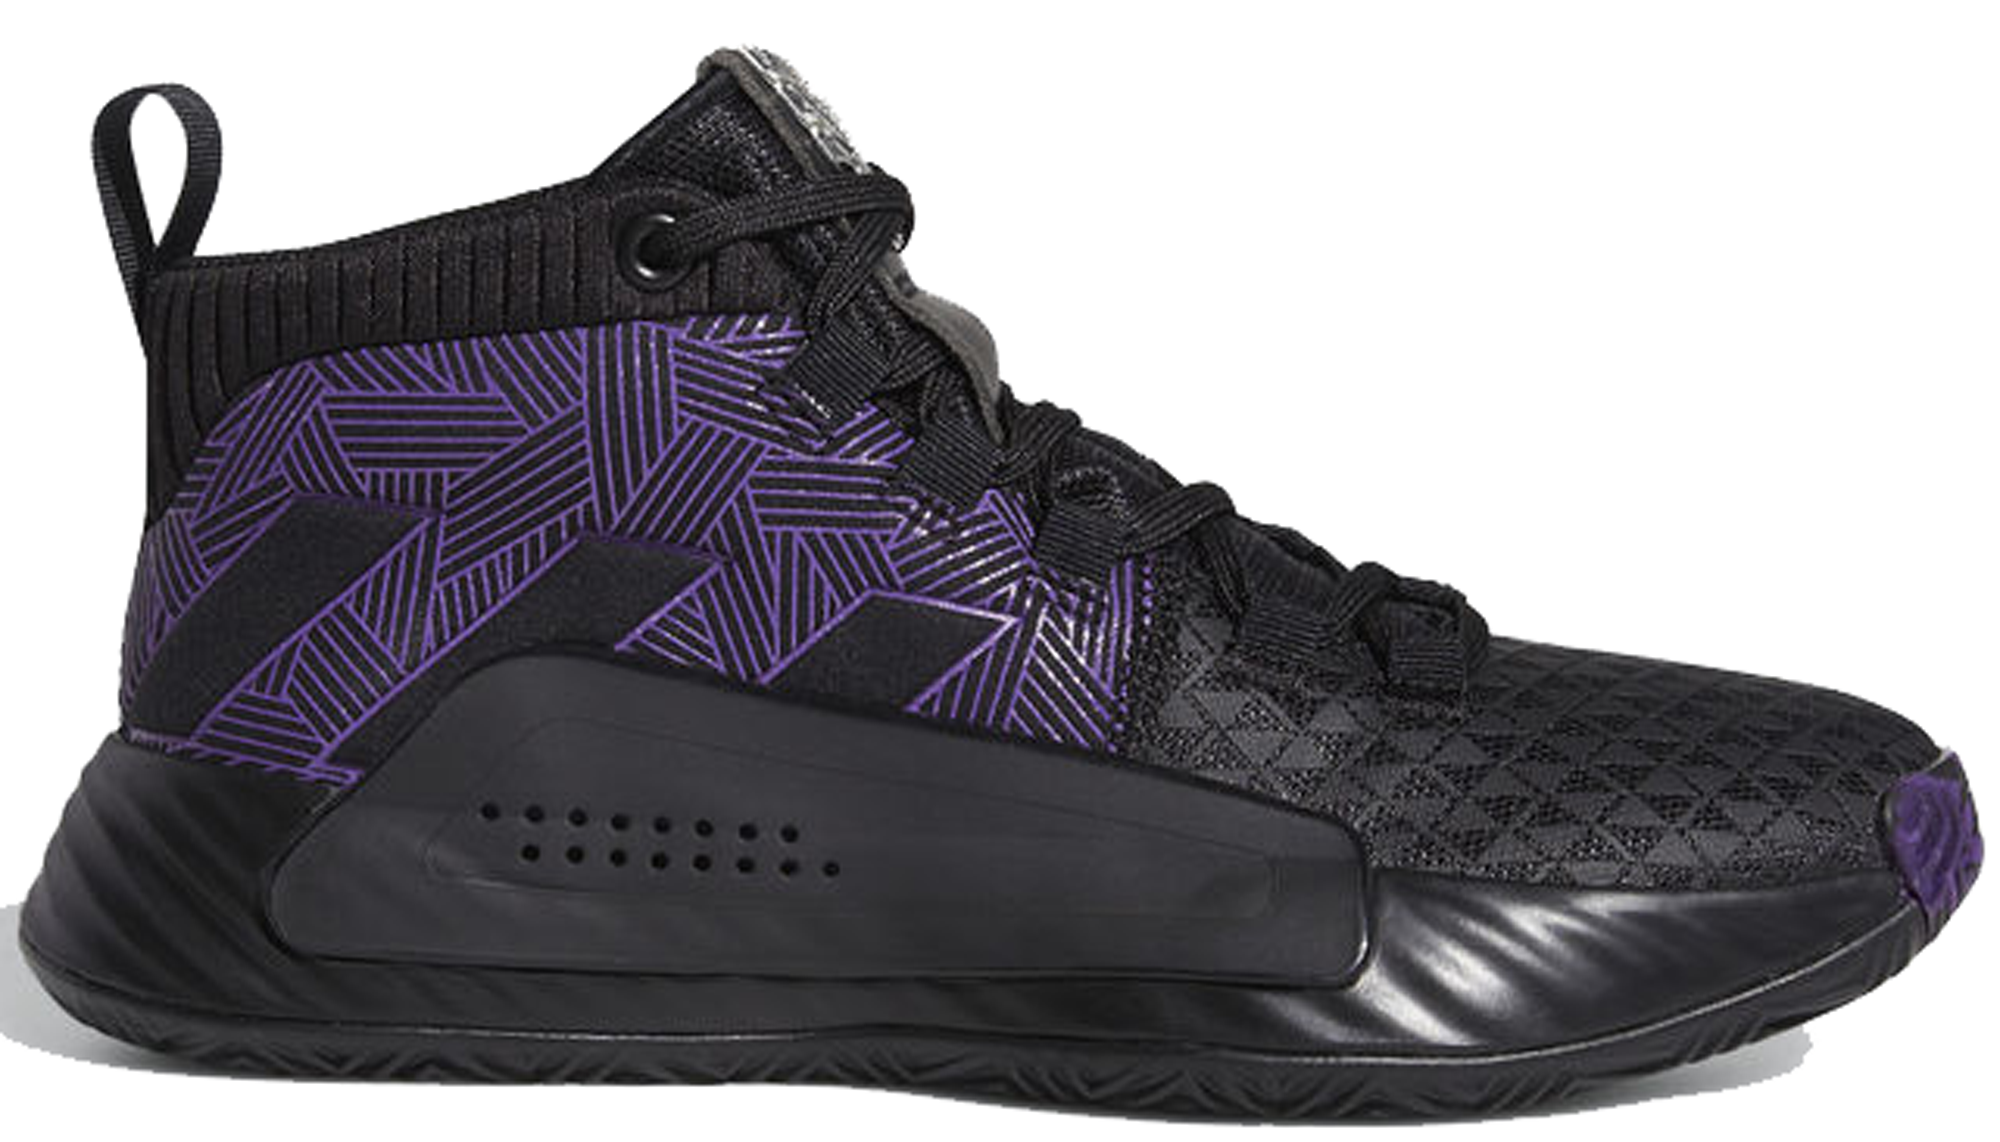 adidas Dame 5 Marvel Black Panther (GS)